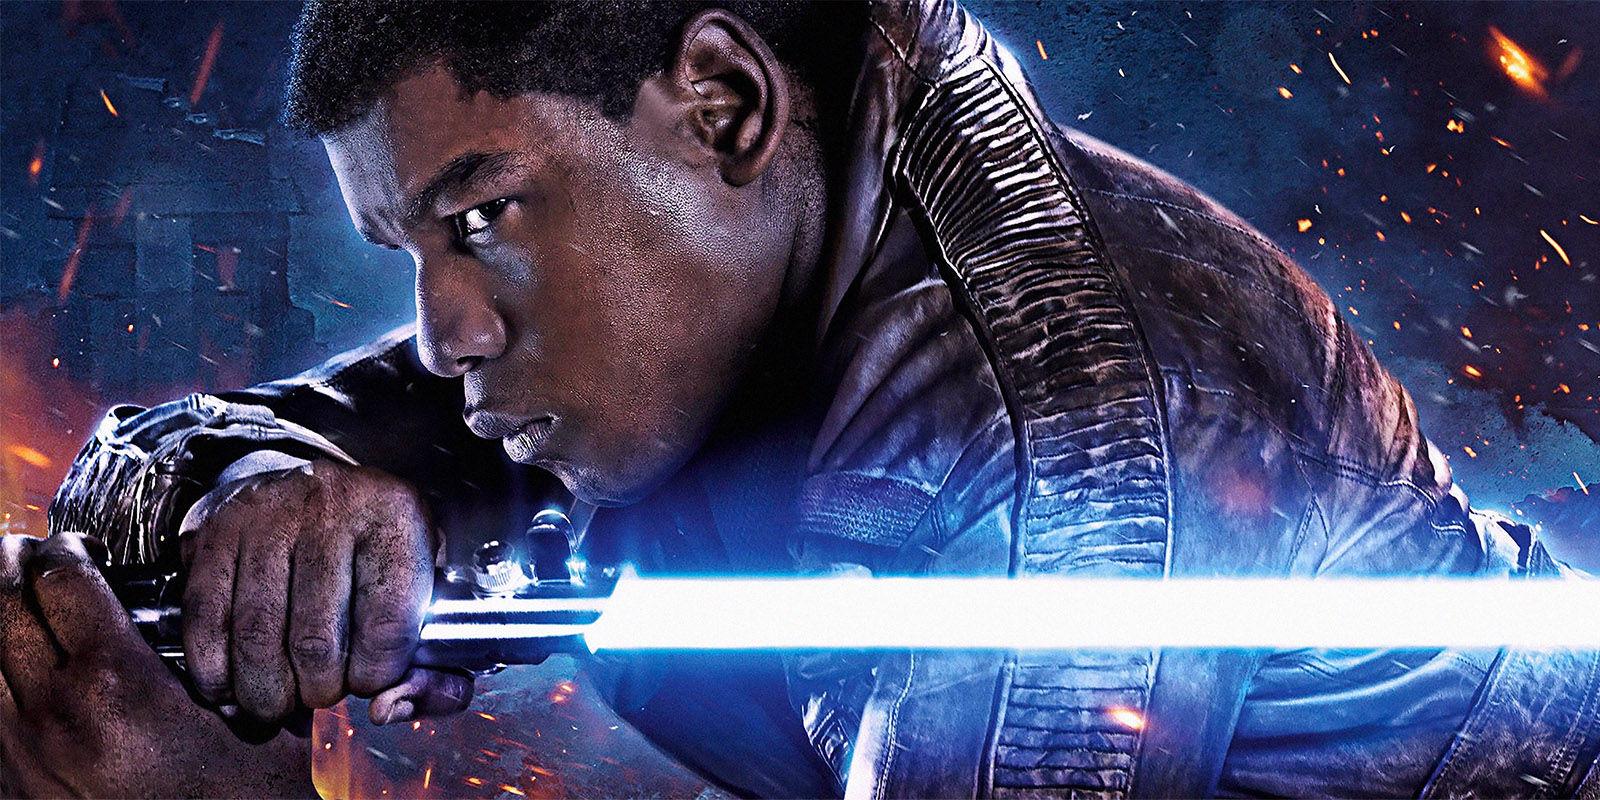 John-Boyega-Finn-Wallpaper-Star-Wars-7